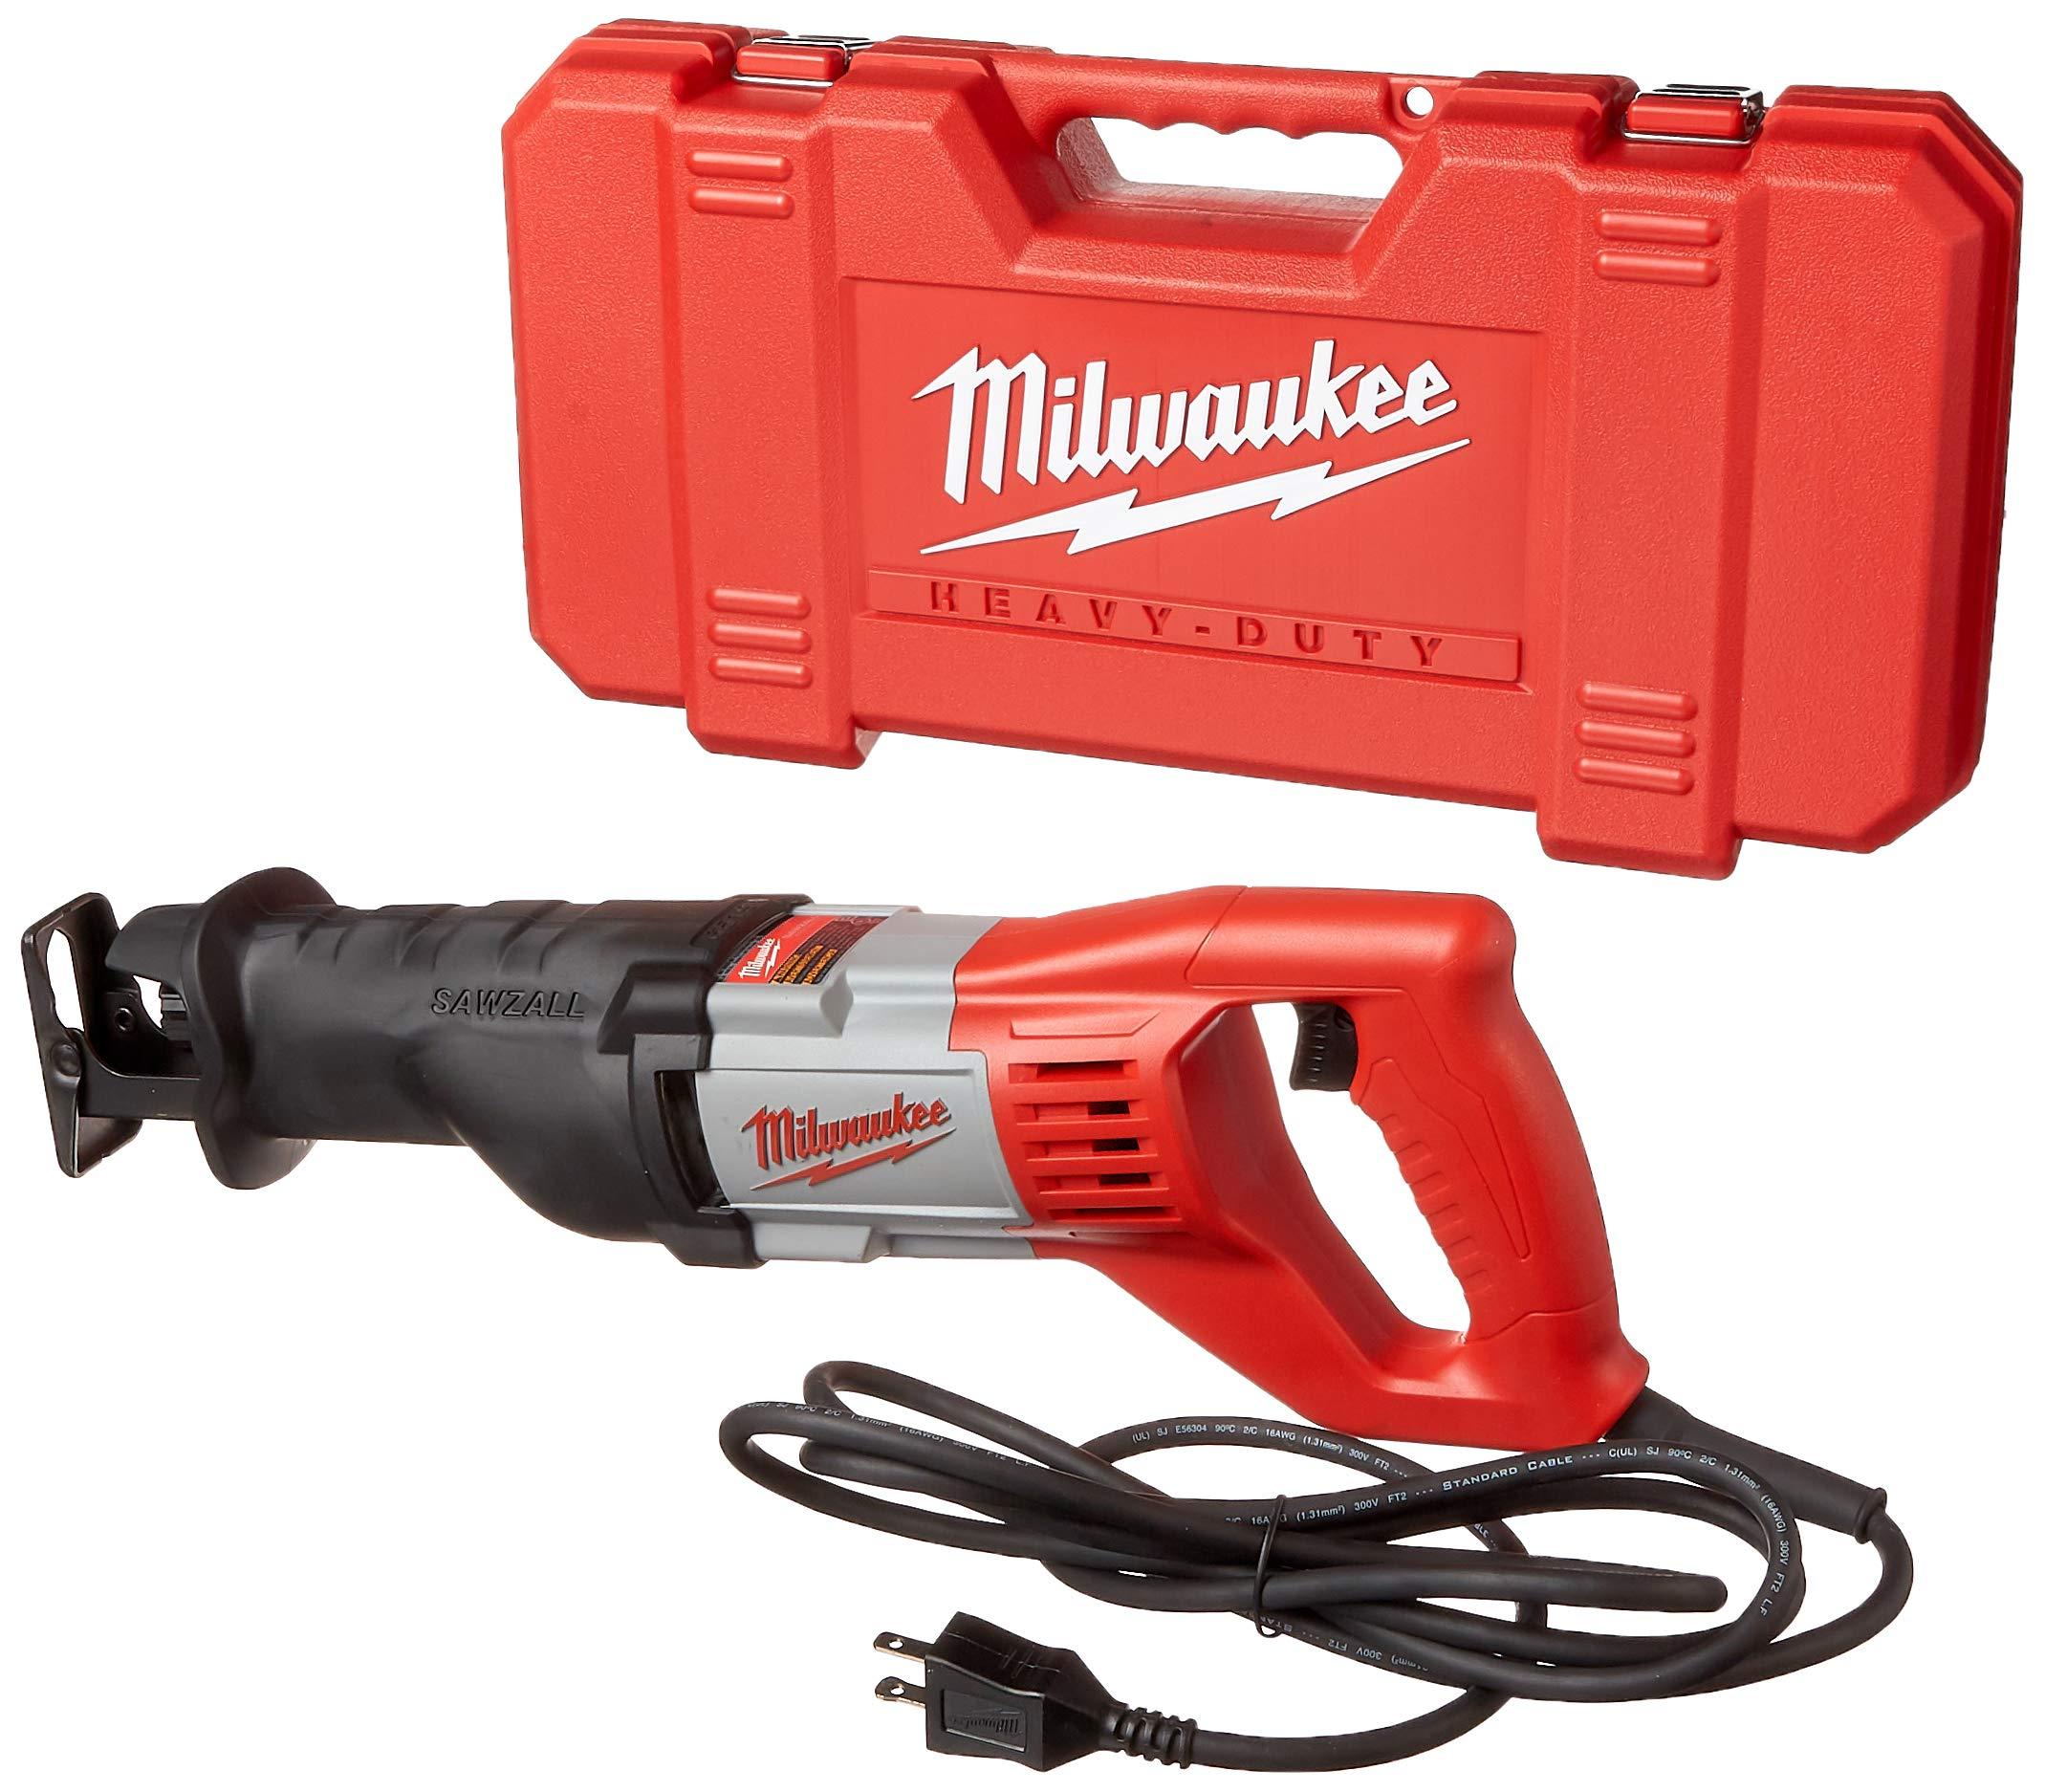 Milwaukee 6519 31 Strokes Reciprocating Variable